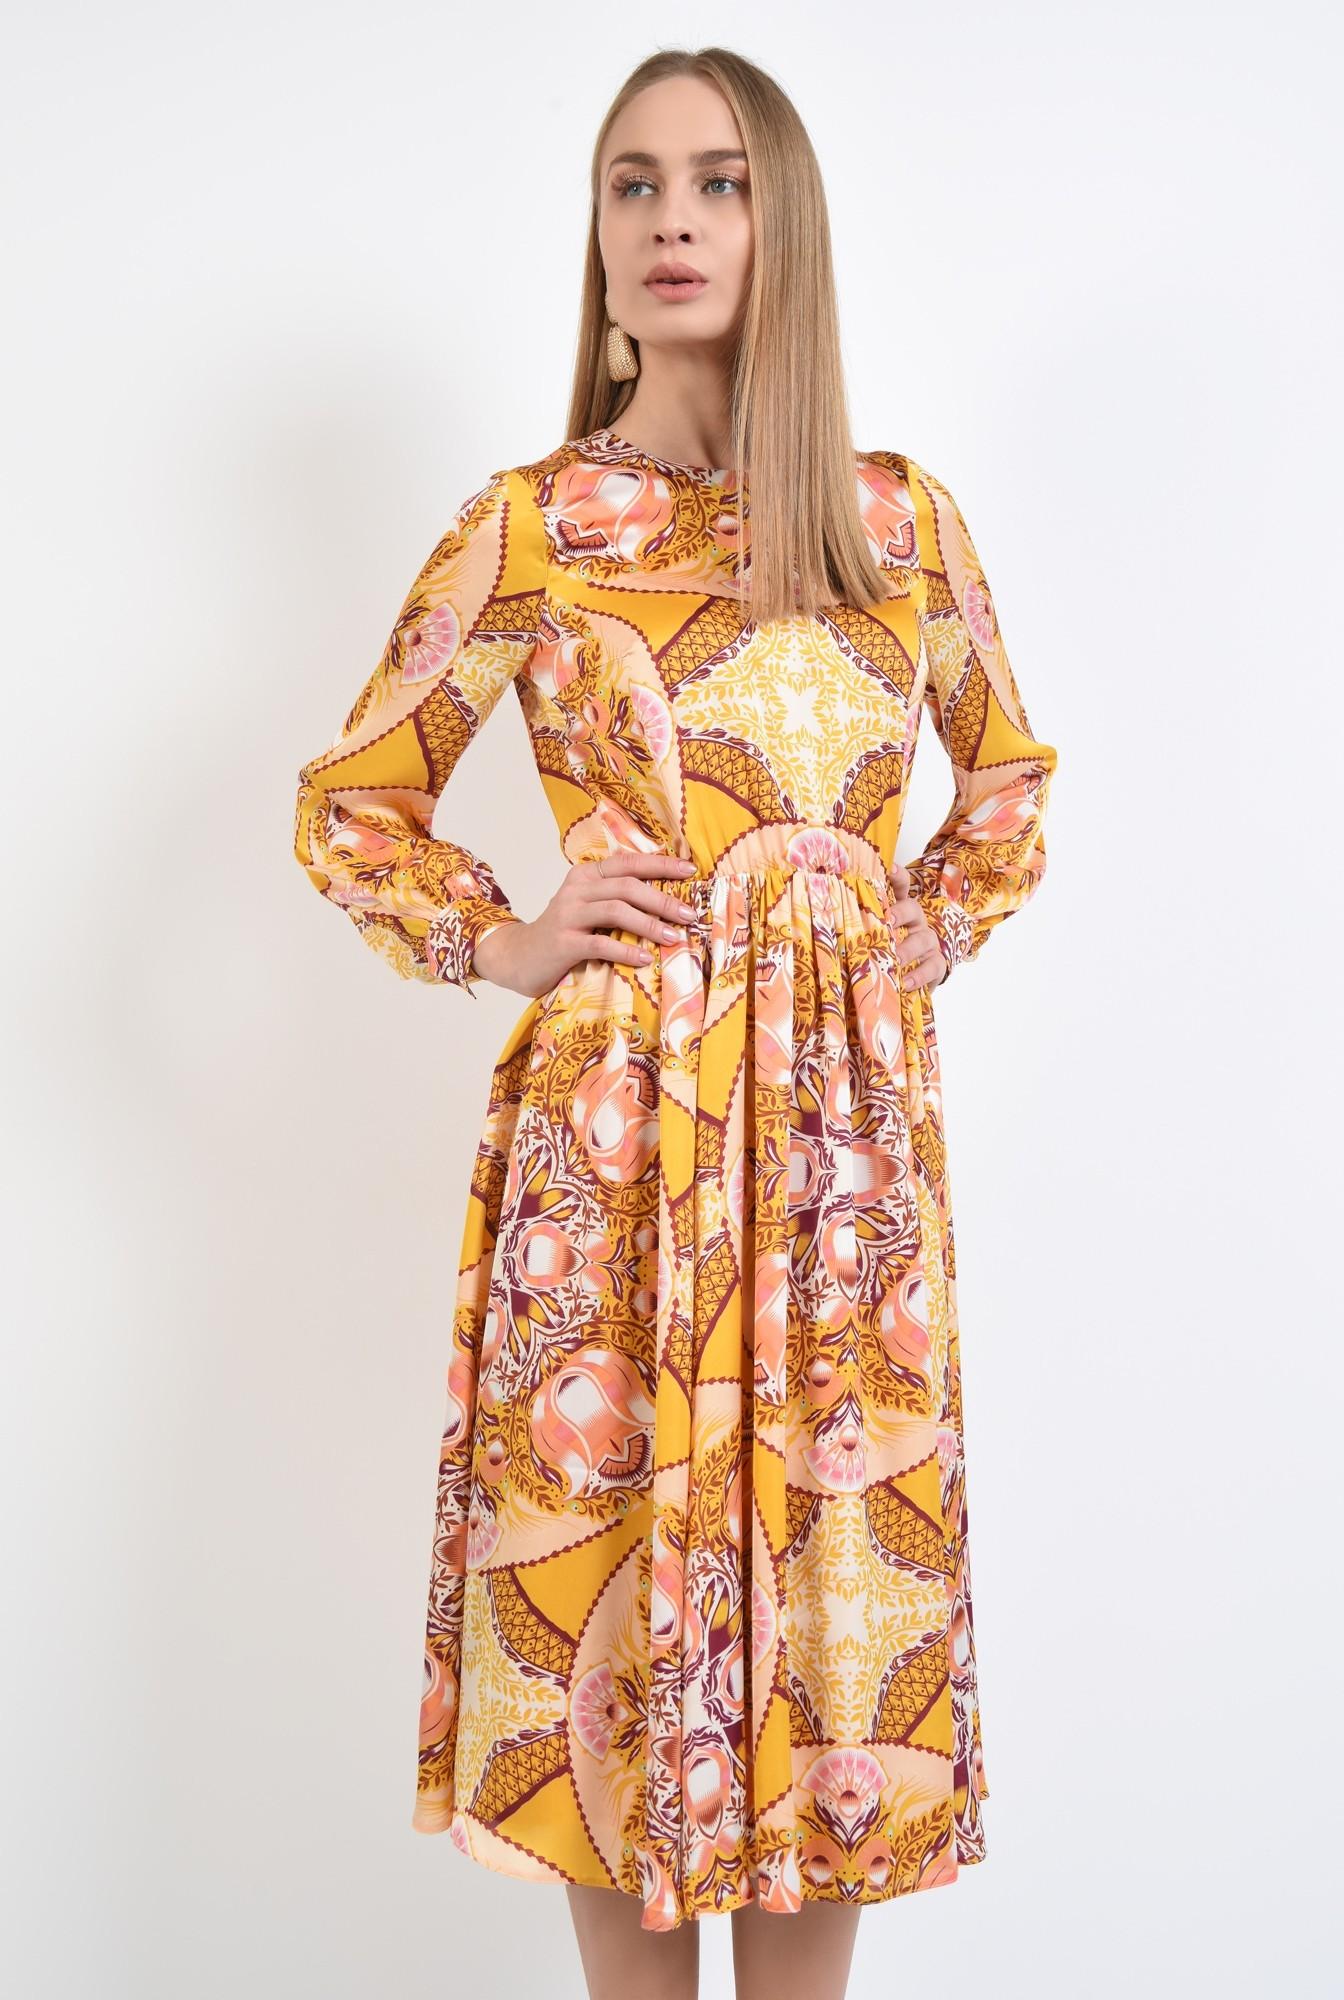 0 - 360 - rochie imprimata, midi, croi pe bie, galben mustar, imprimeu abstract